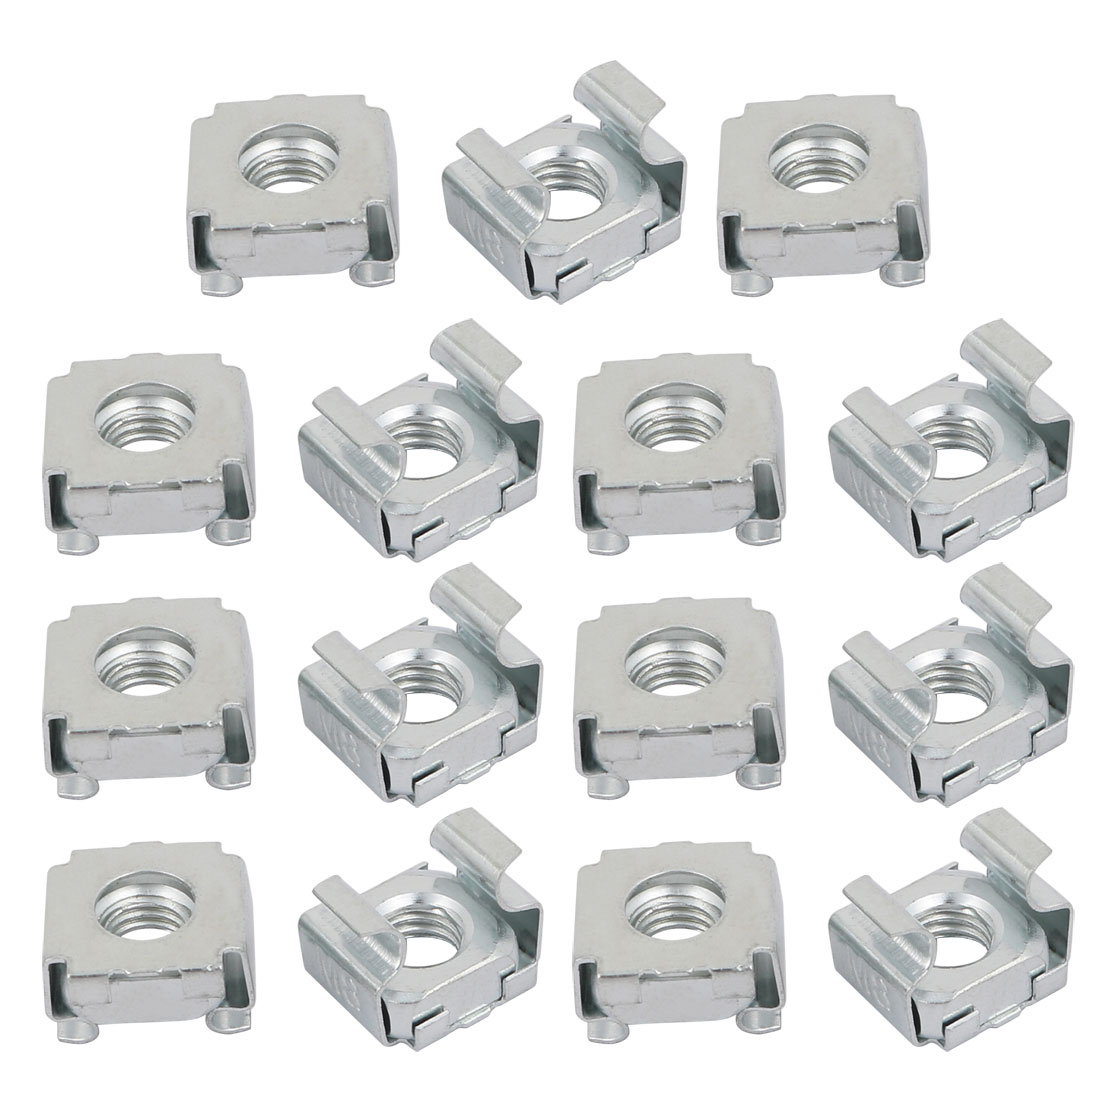 15pcs M8 Carbon Steel Zinc Plated Cage Nut Silver Tone for Server Shelf Cabinet